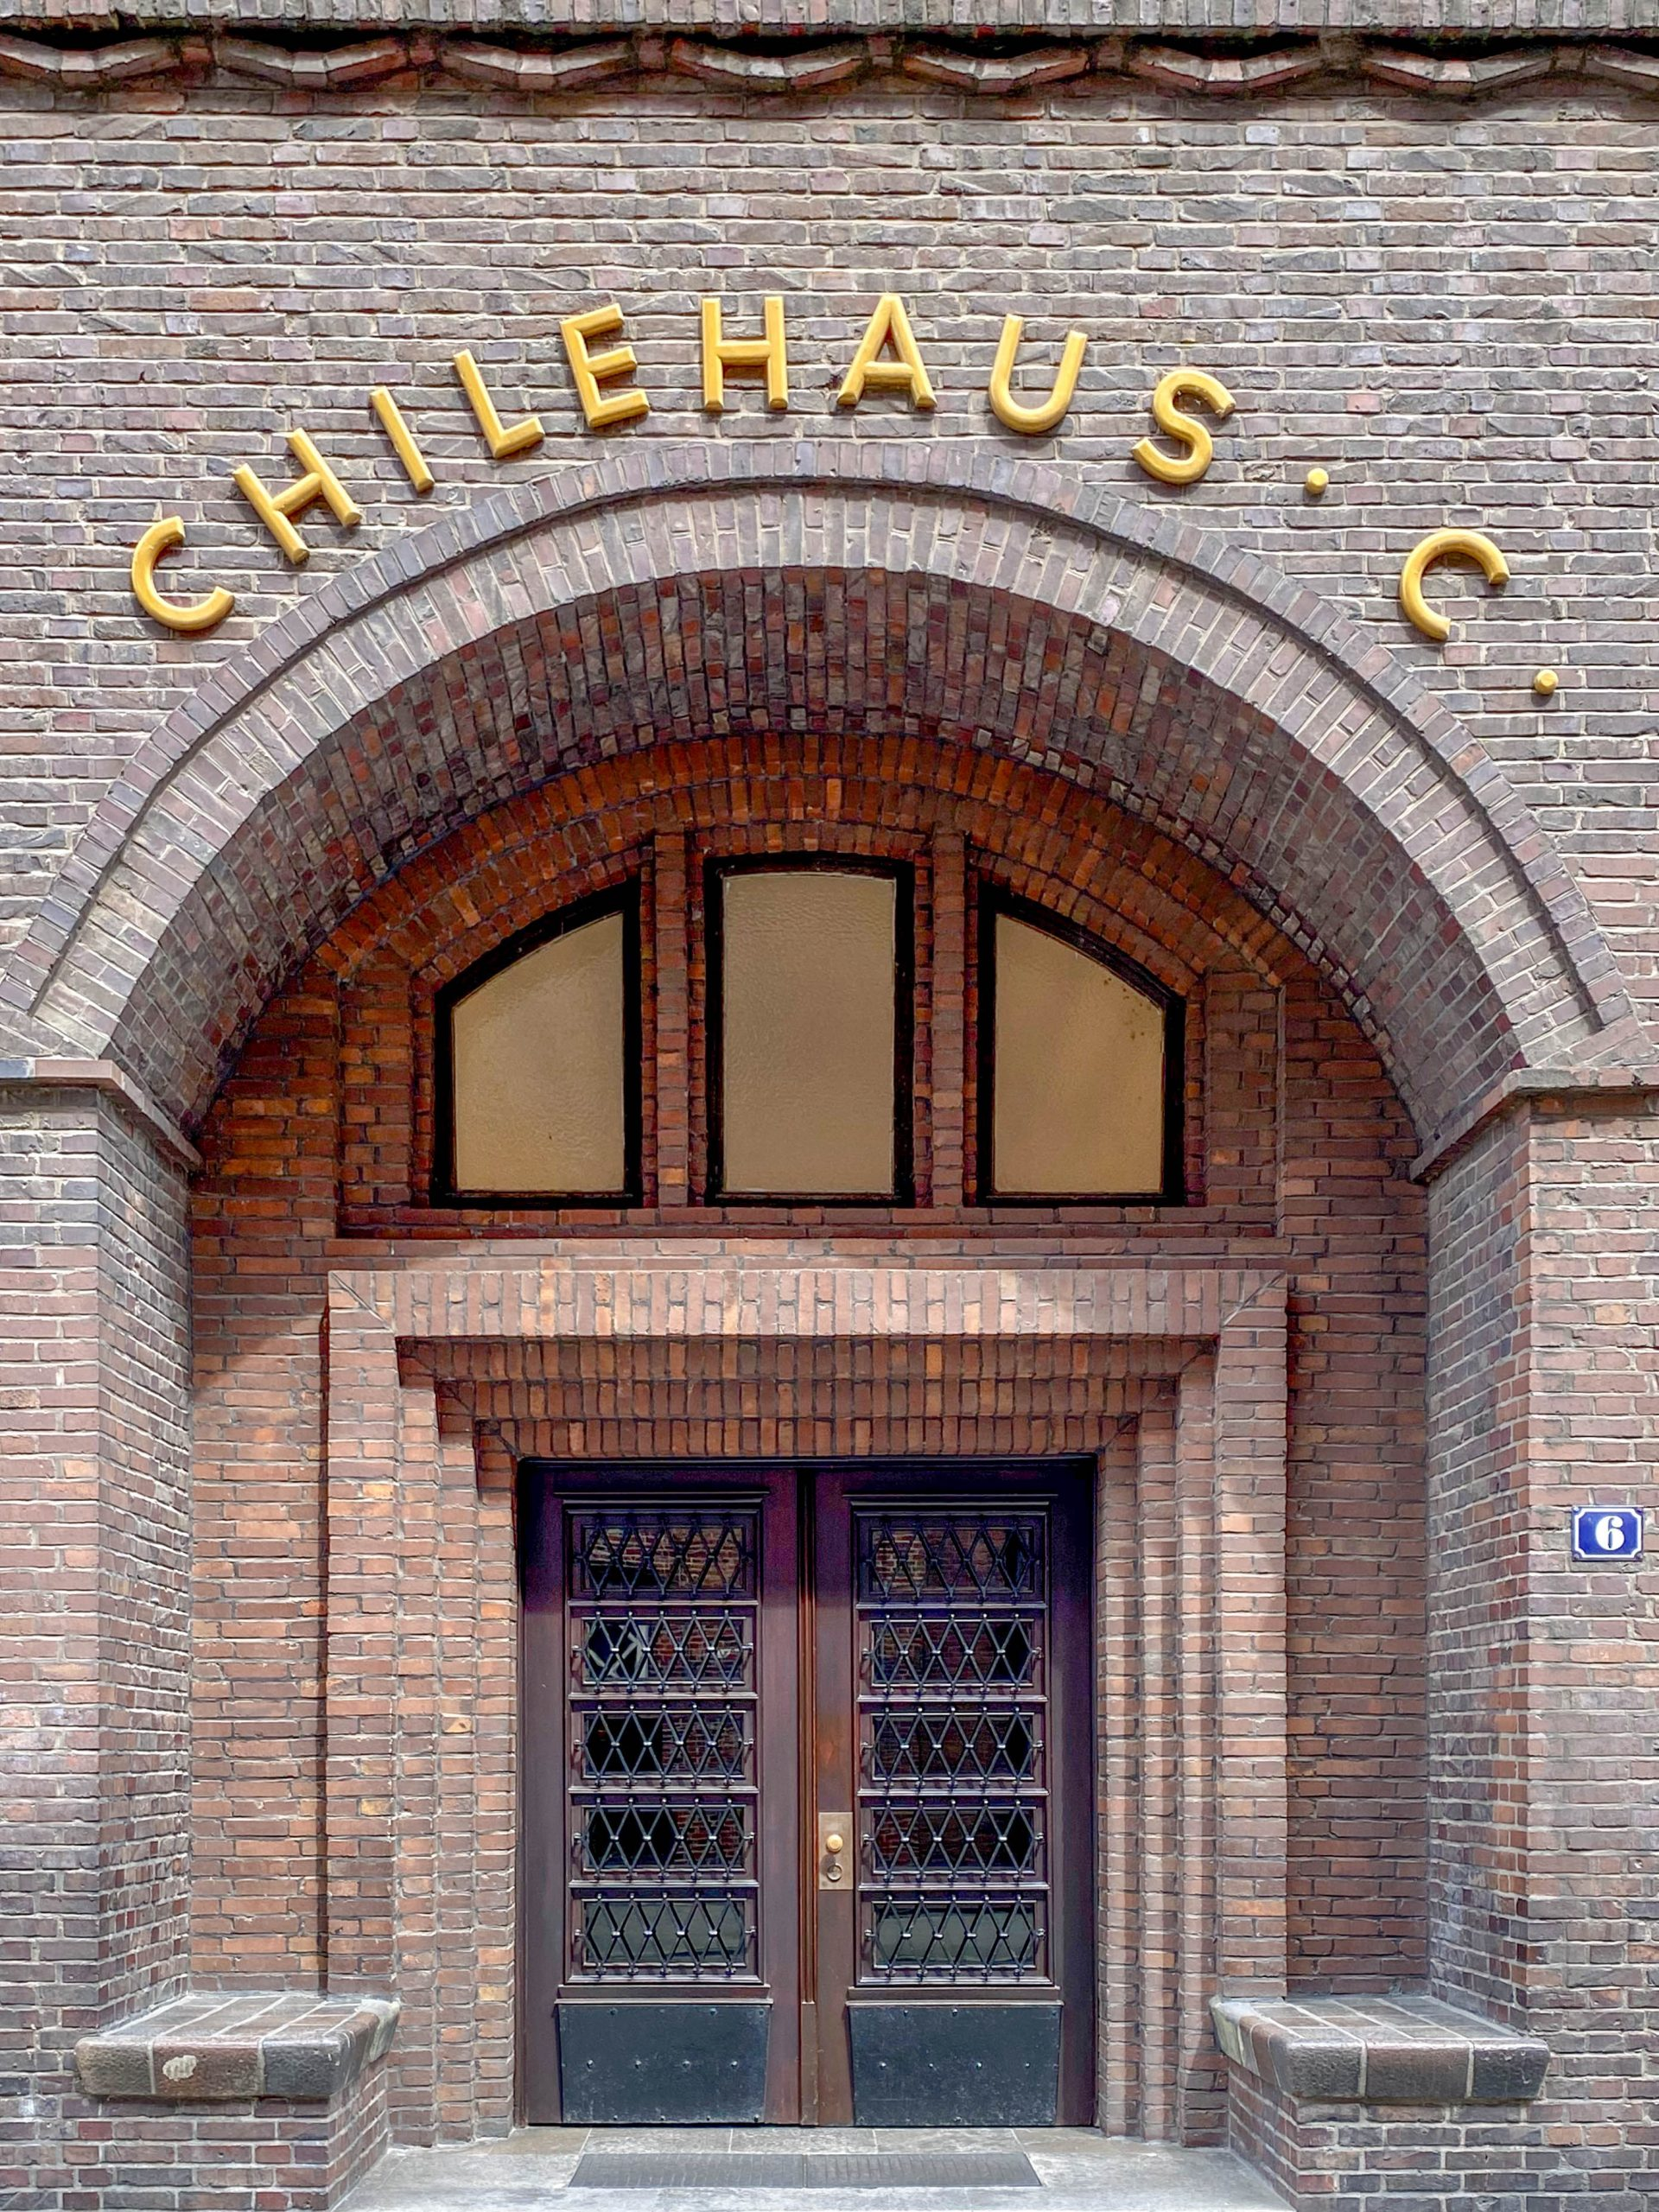 Chilehaus, 1922-1924. Architect: Fritz Höger